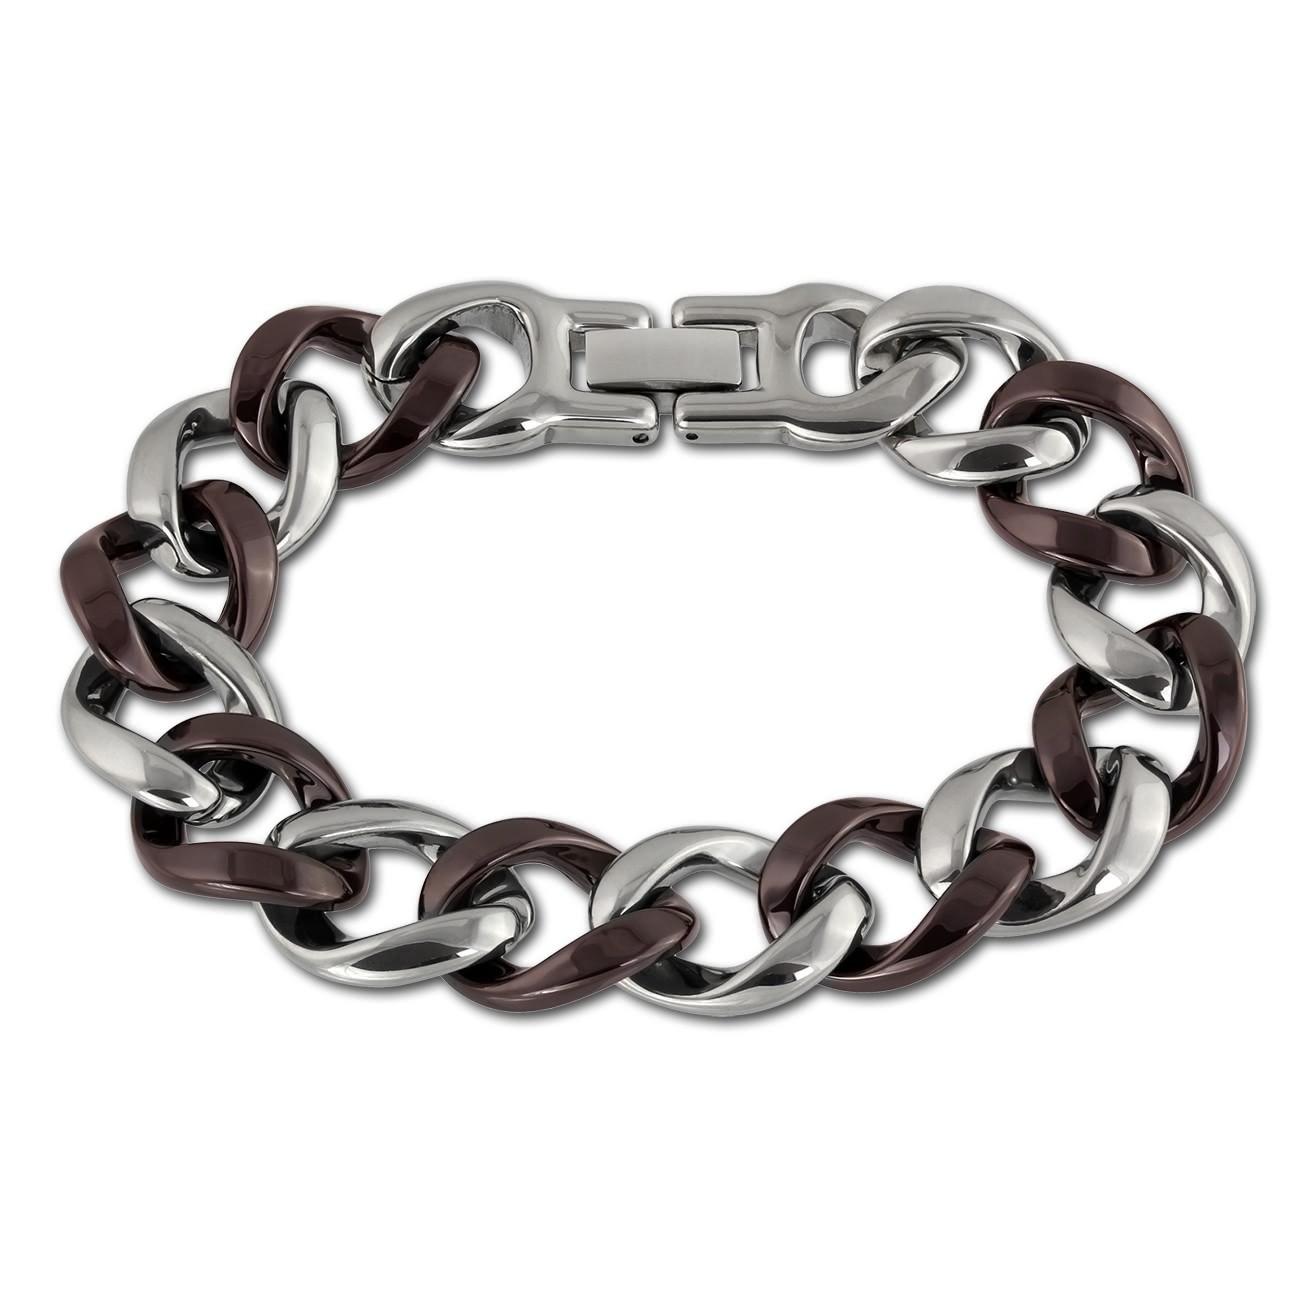 Amello Armband Keramik Panzer rotbraun Damen Edelstahlschmuck ESAX18N0